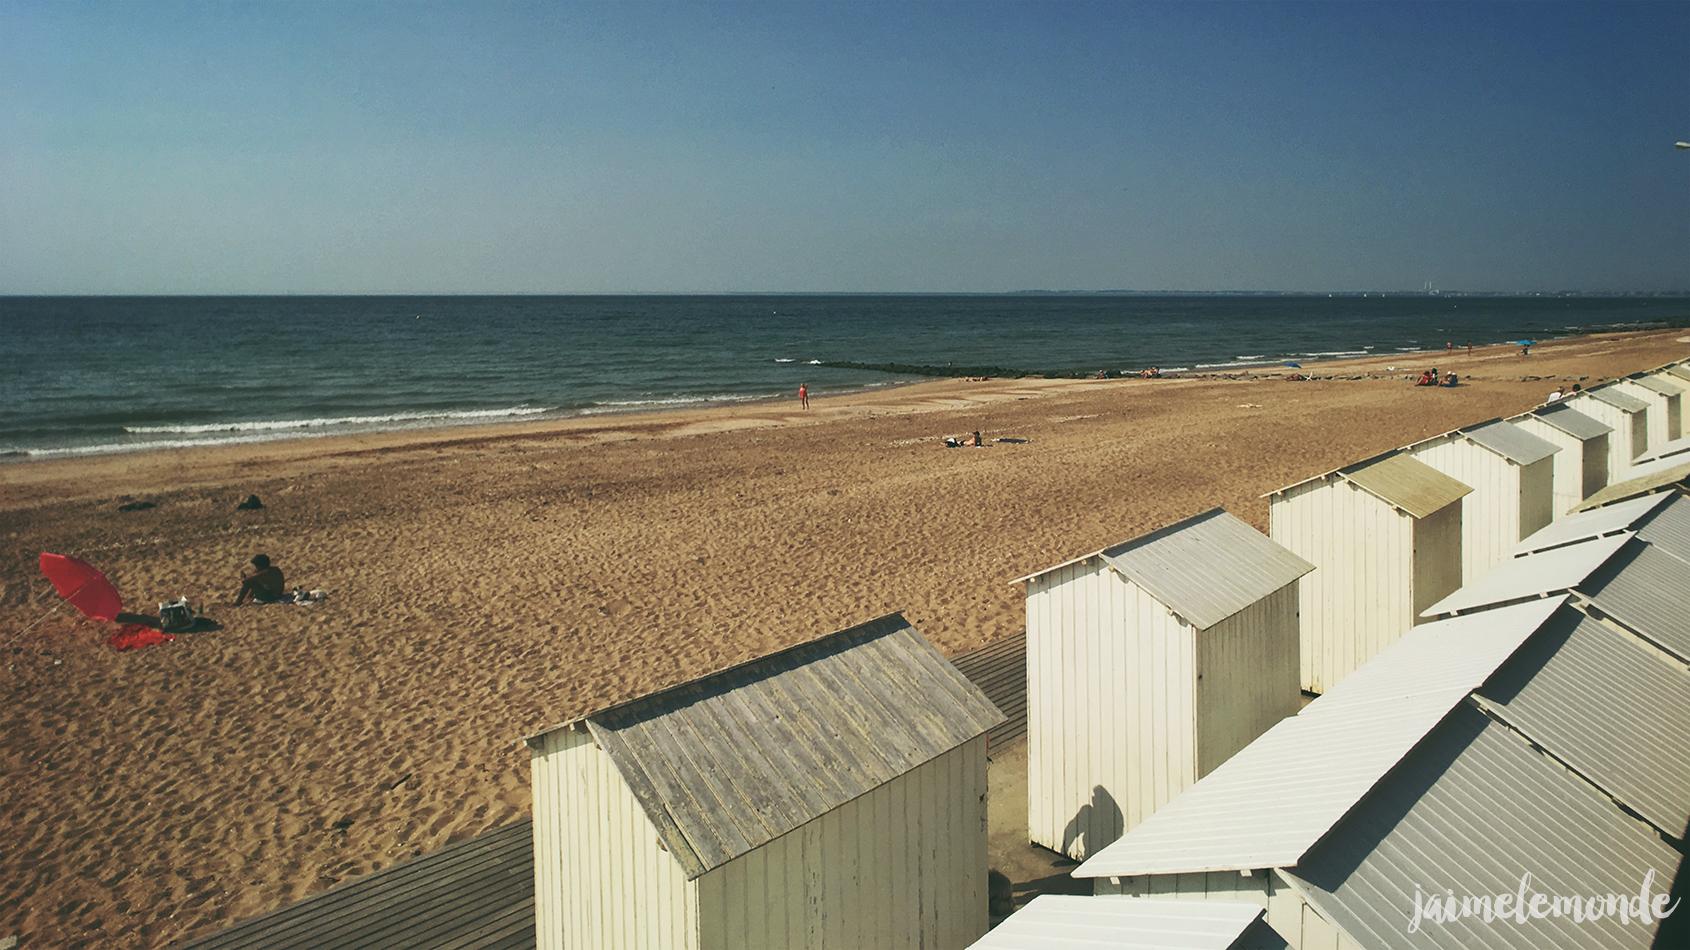 Pixter - Grand angle pro - Blonville sur mer - ©jaimelemonde (6)